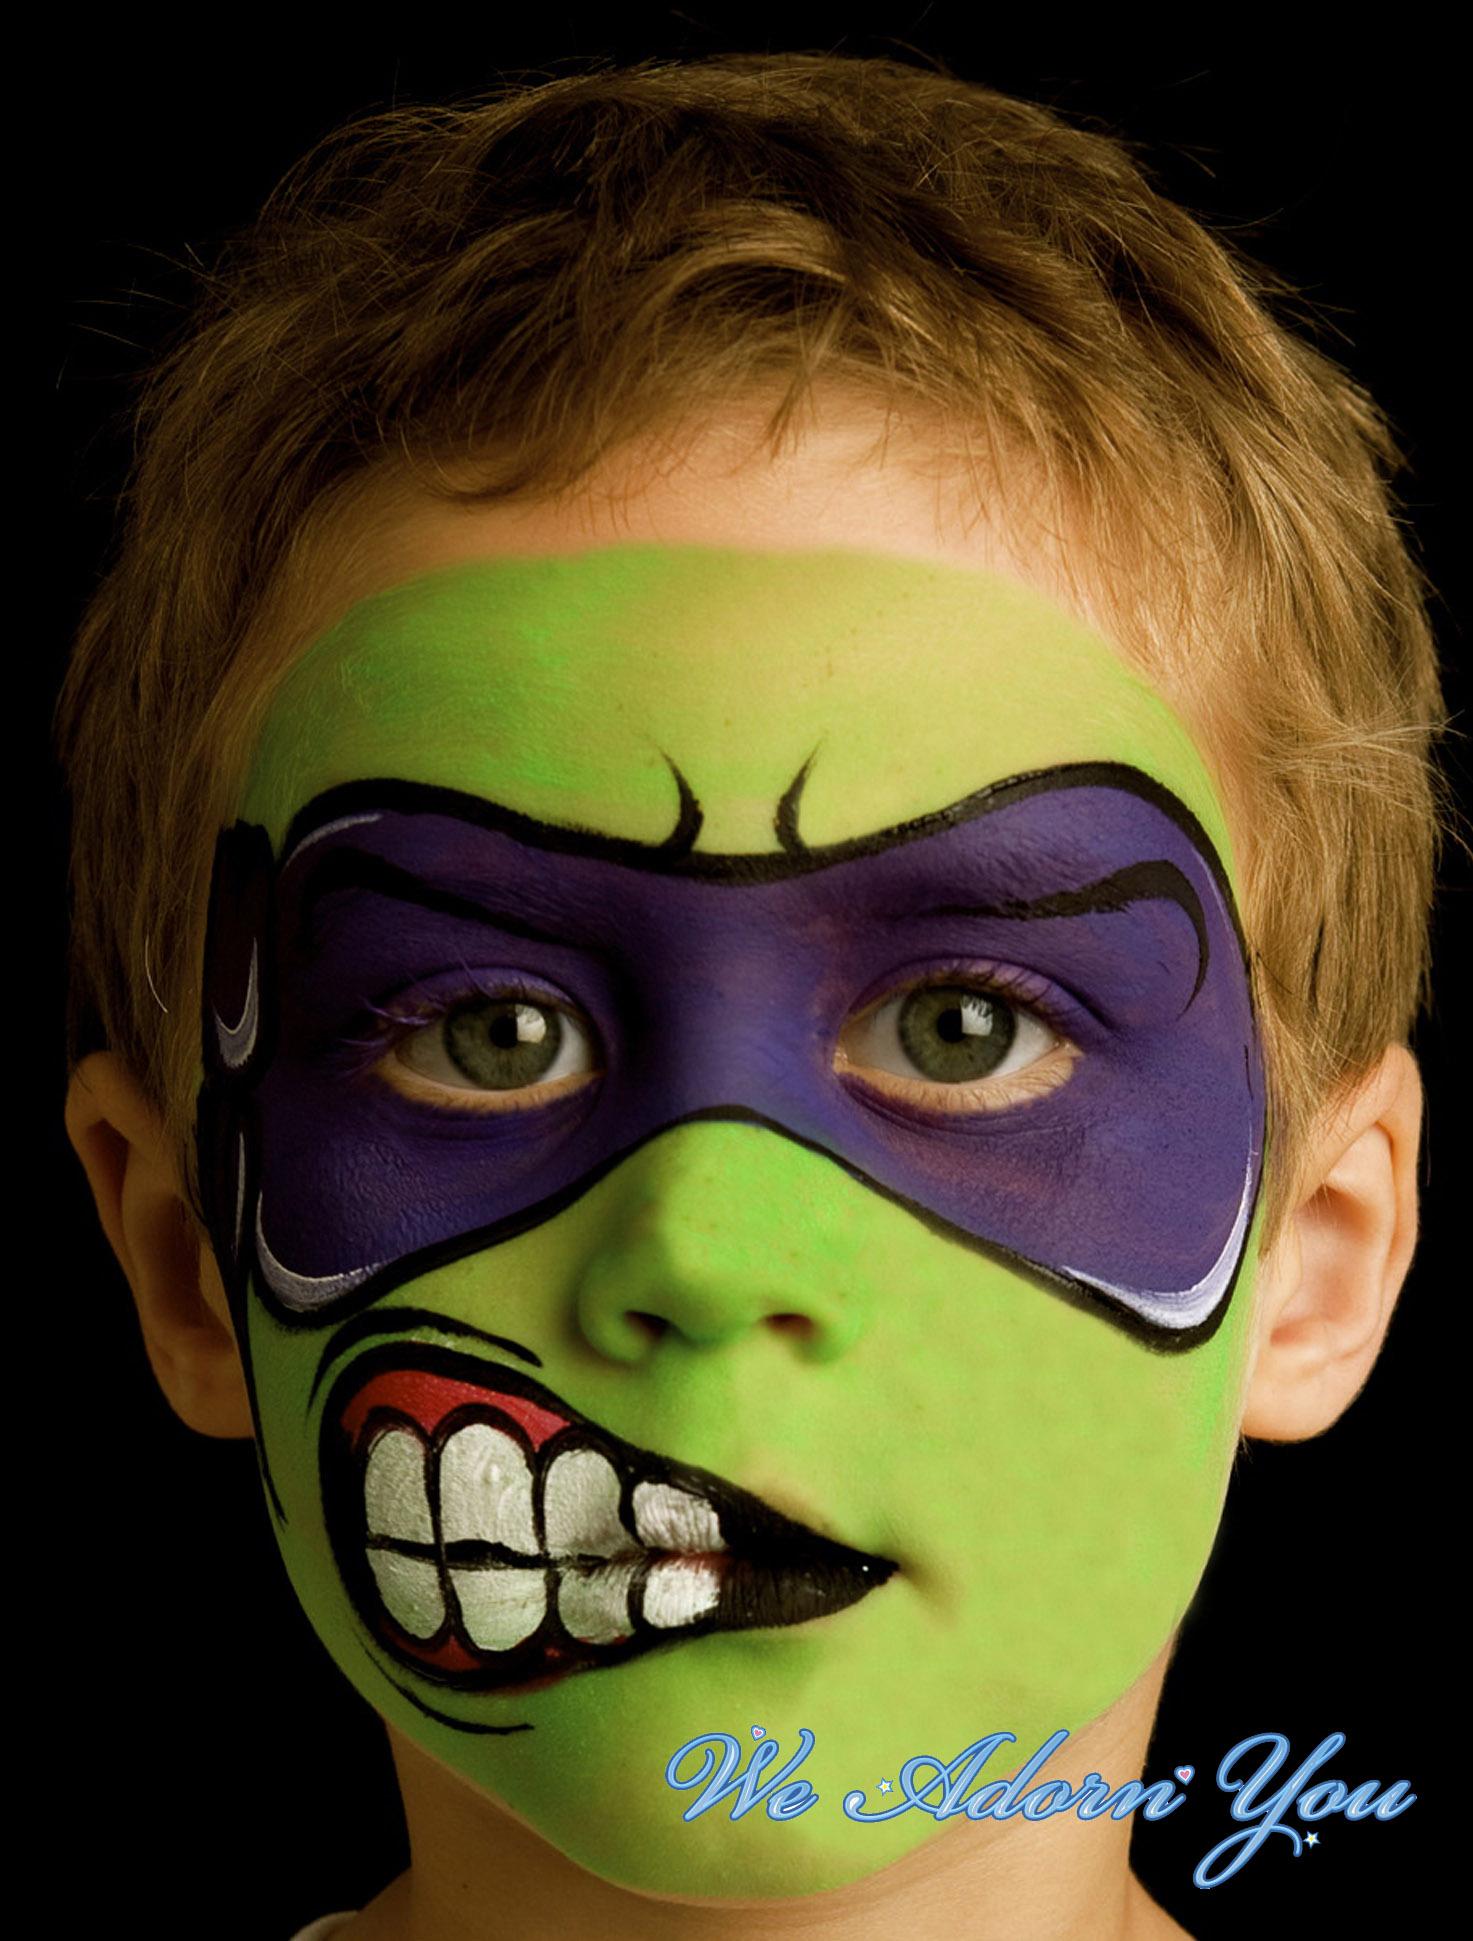 Face Painting Tenage Mutant Ninja Turtle- We Adorn You.jpg